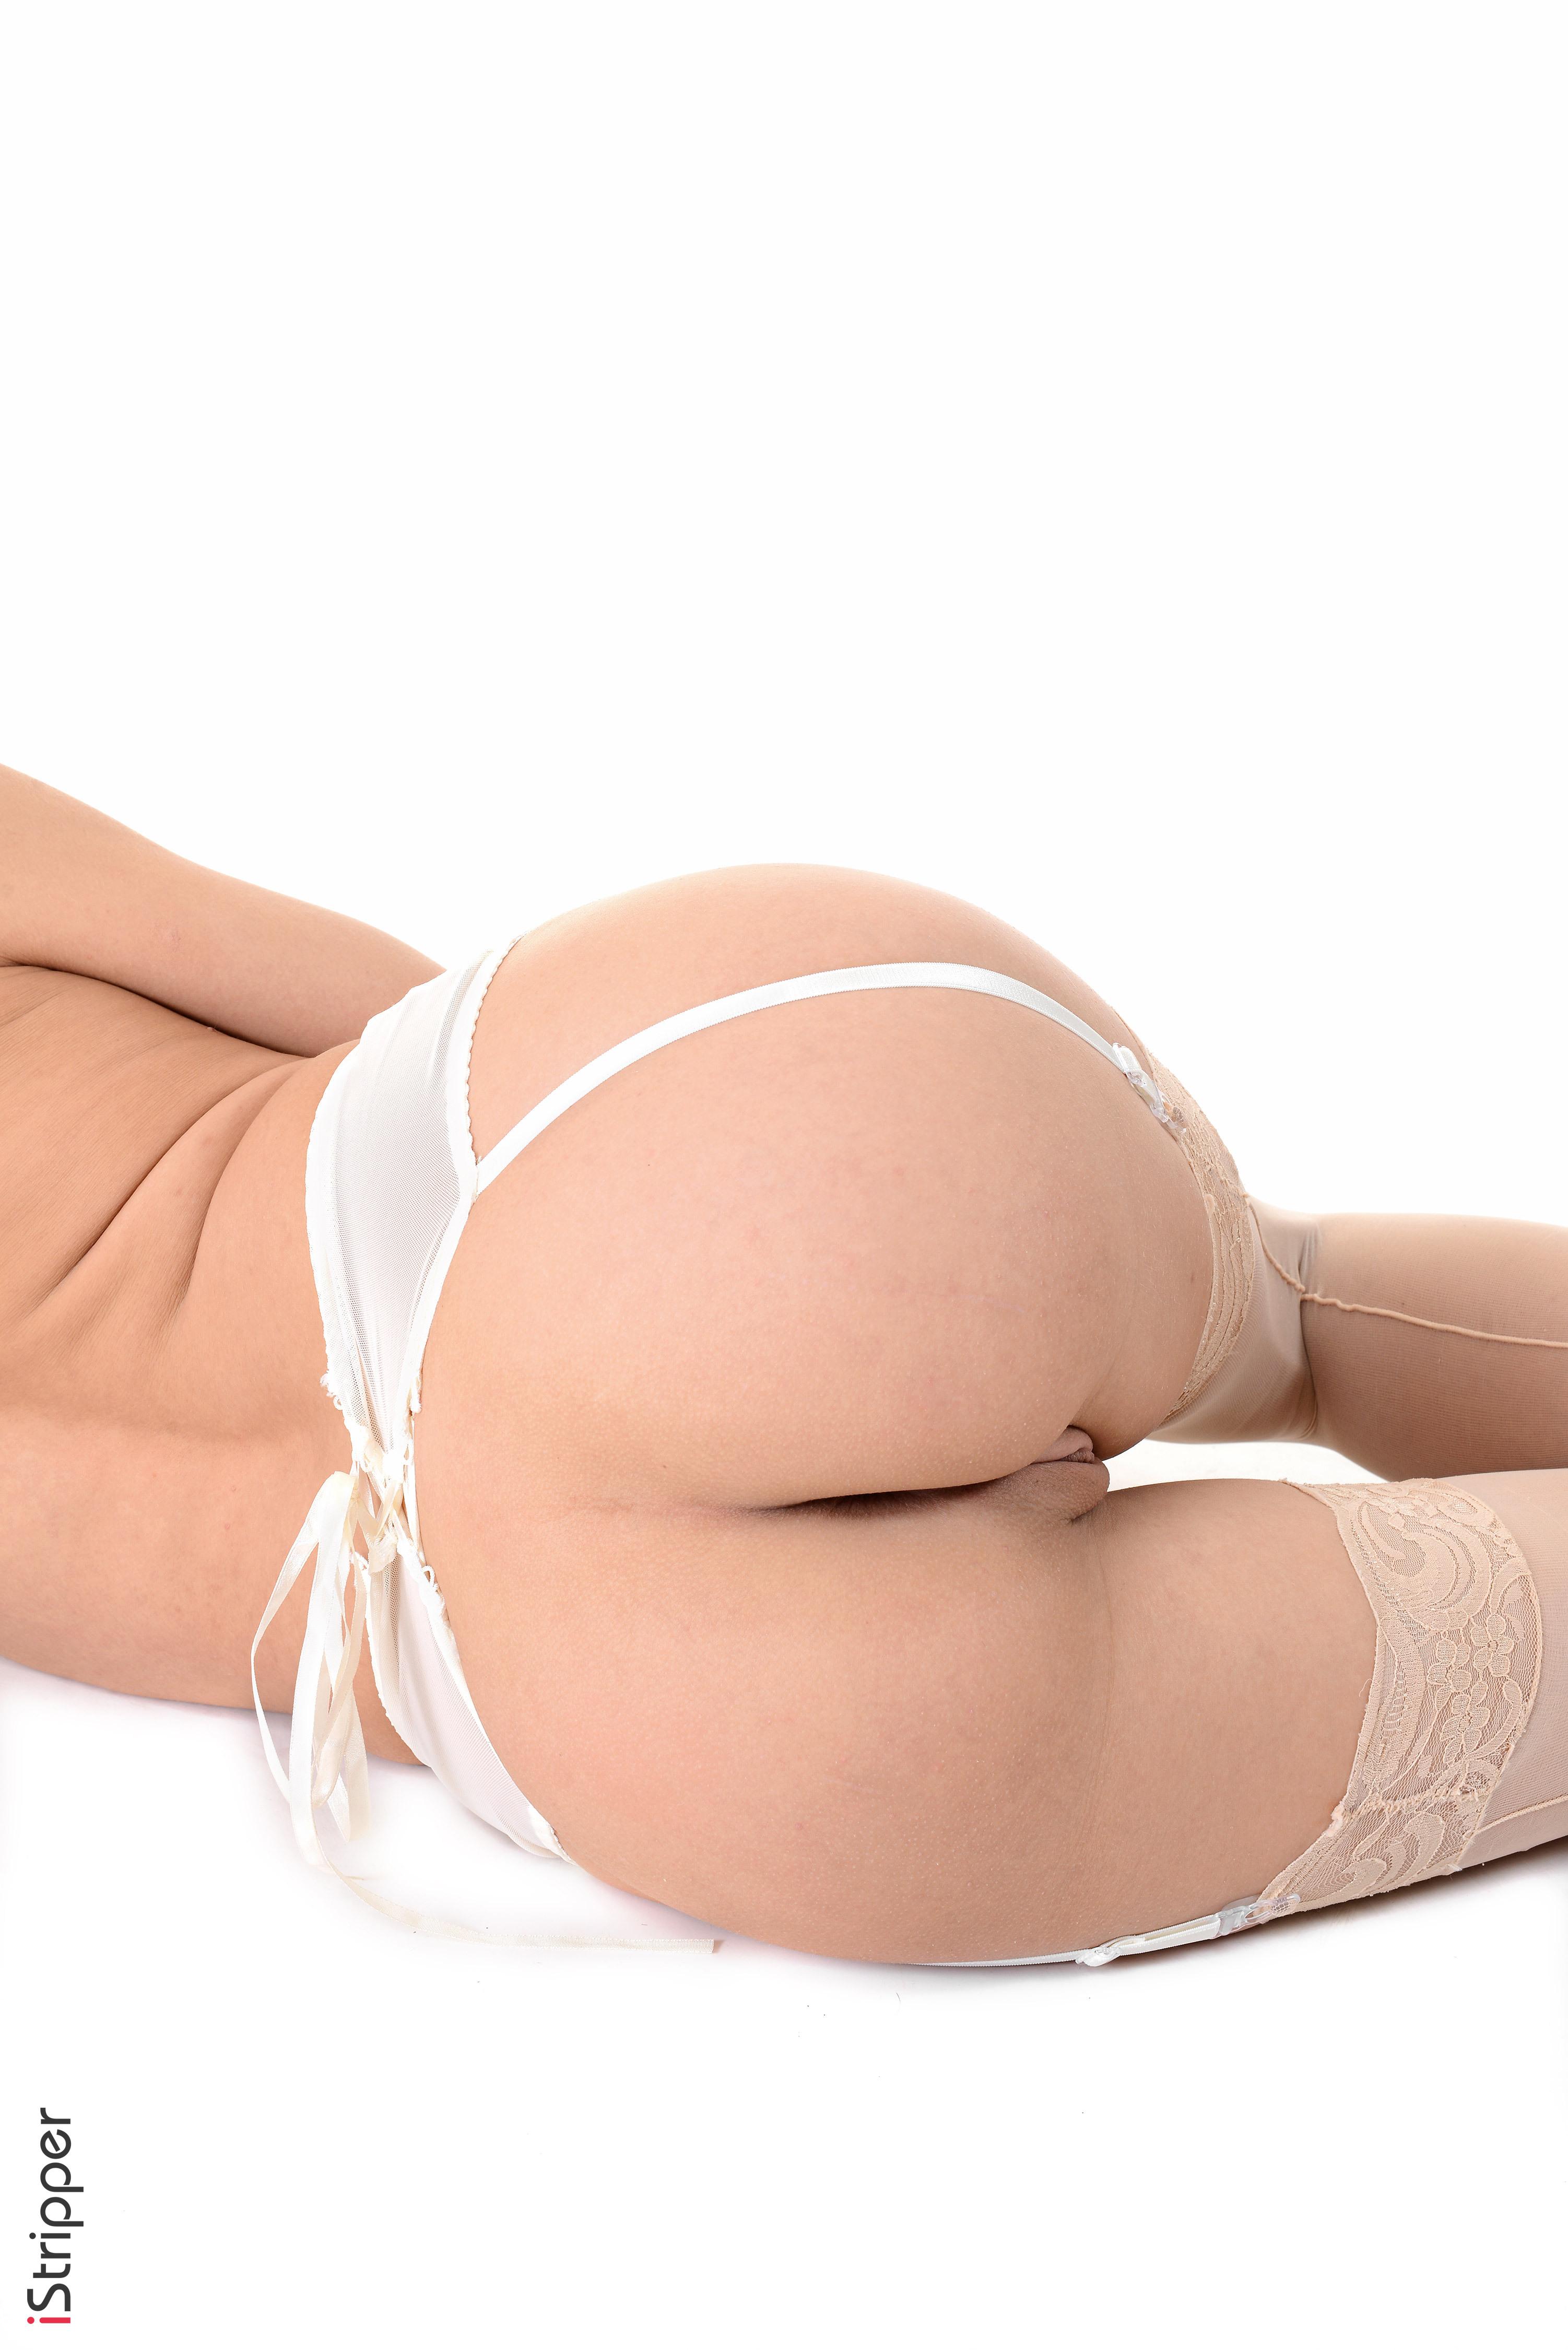 cartoon girls stripping